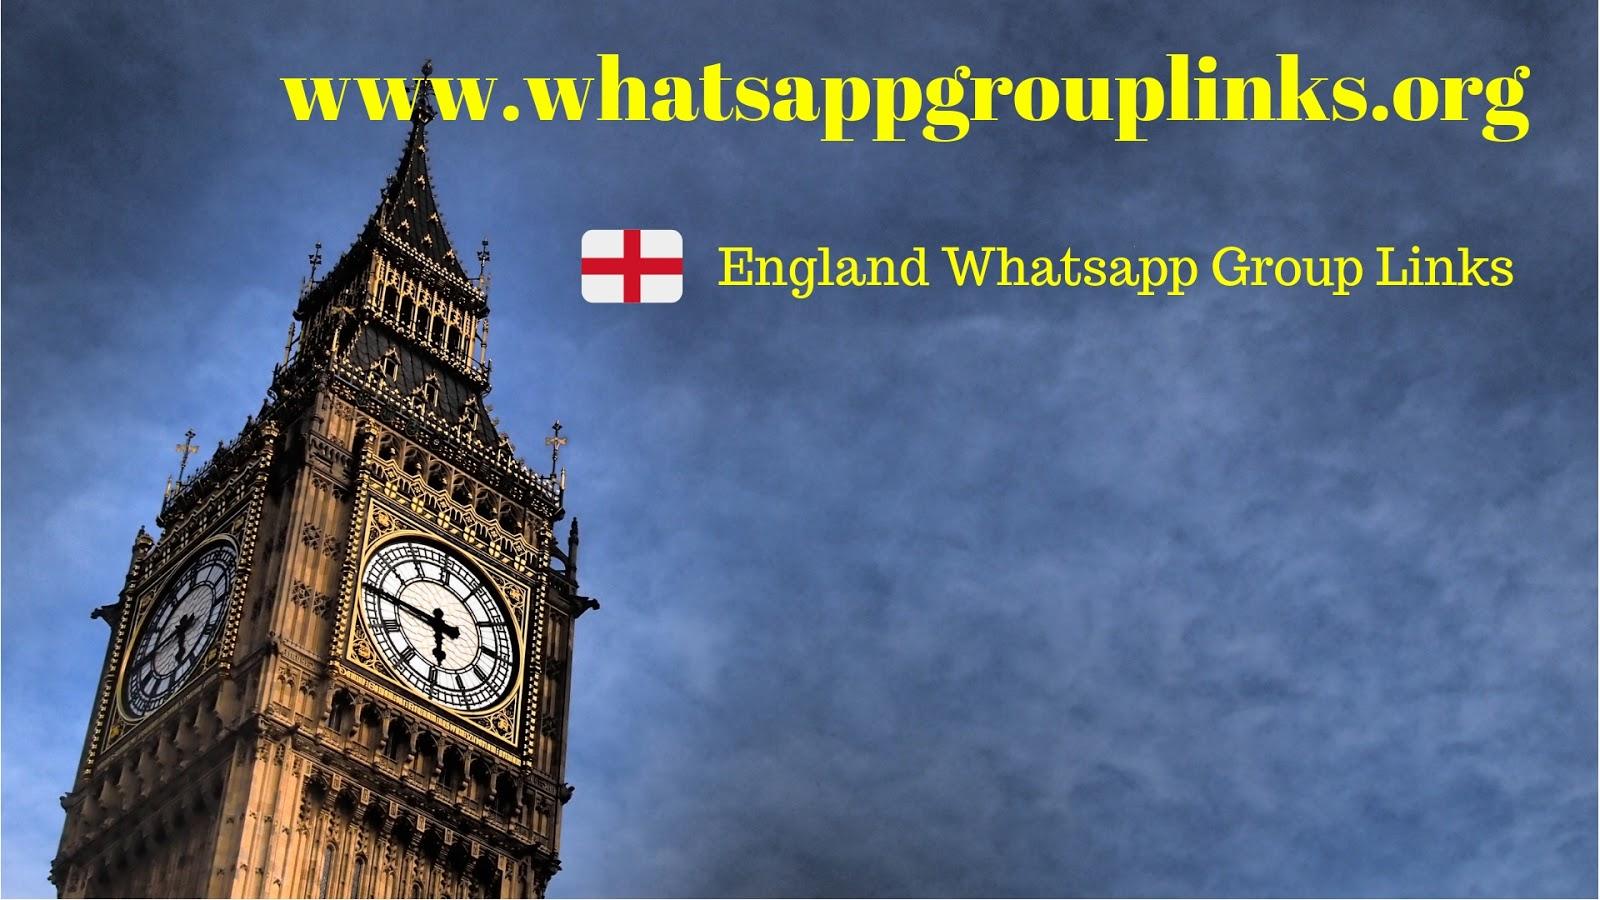 England Whatsapp Group Links - Whatsapp Group Links